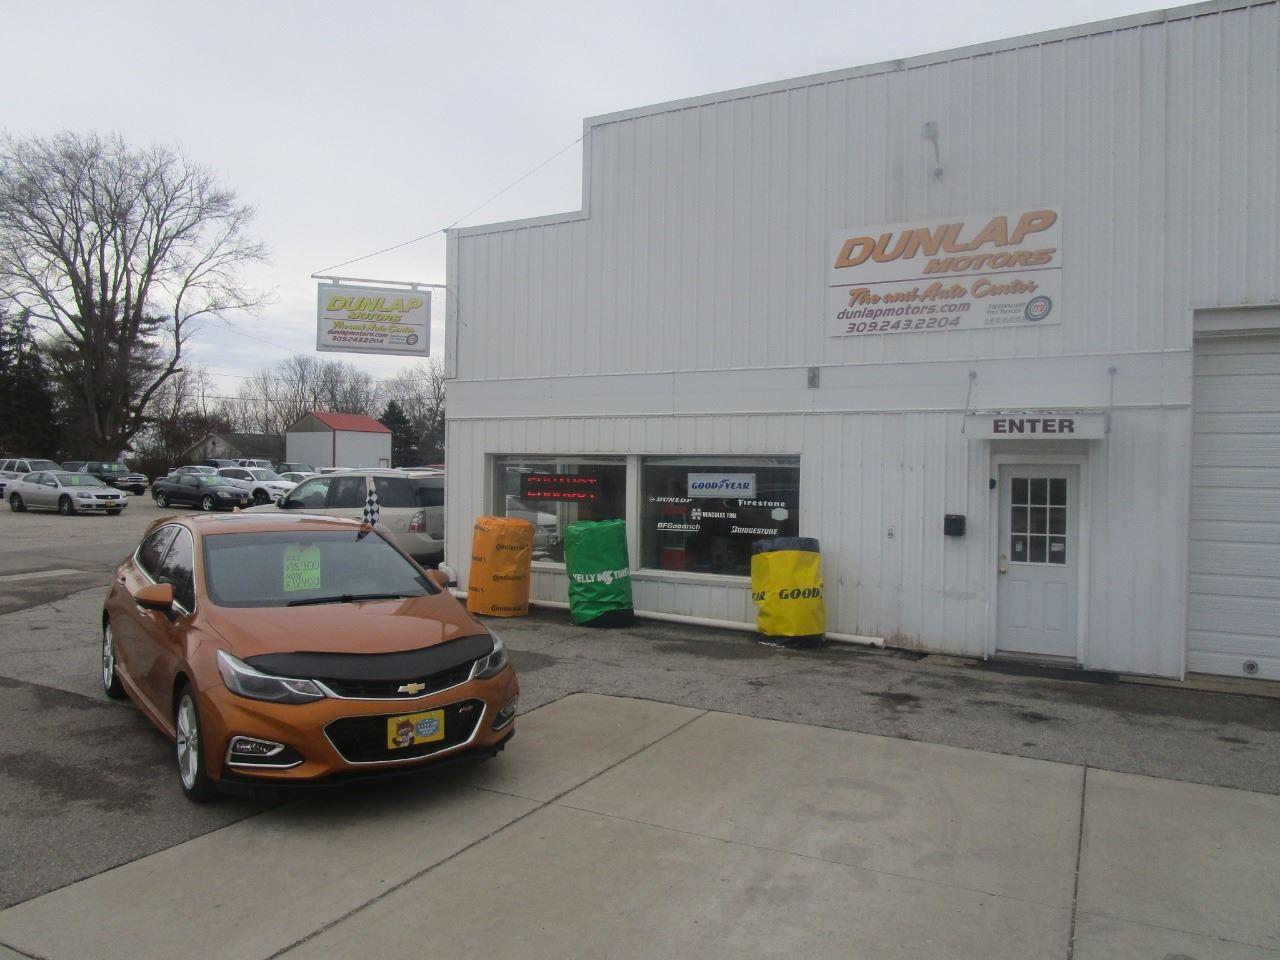 Dunlap Motors